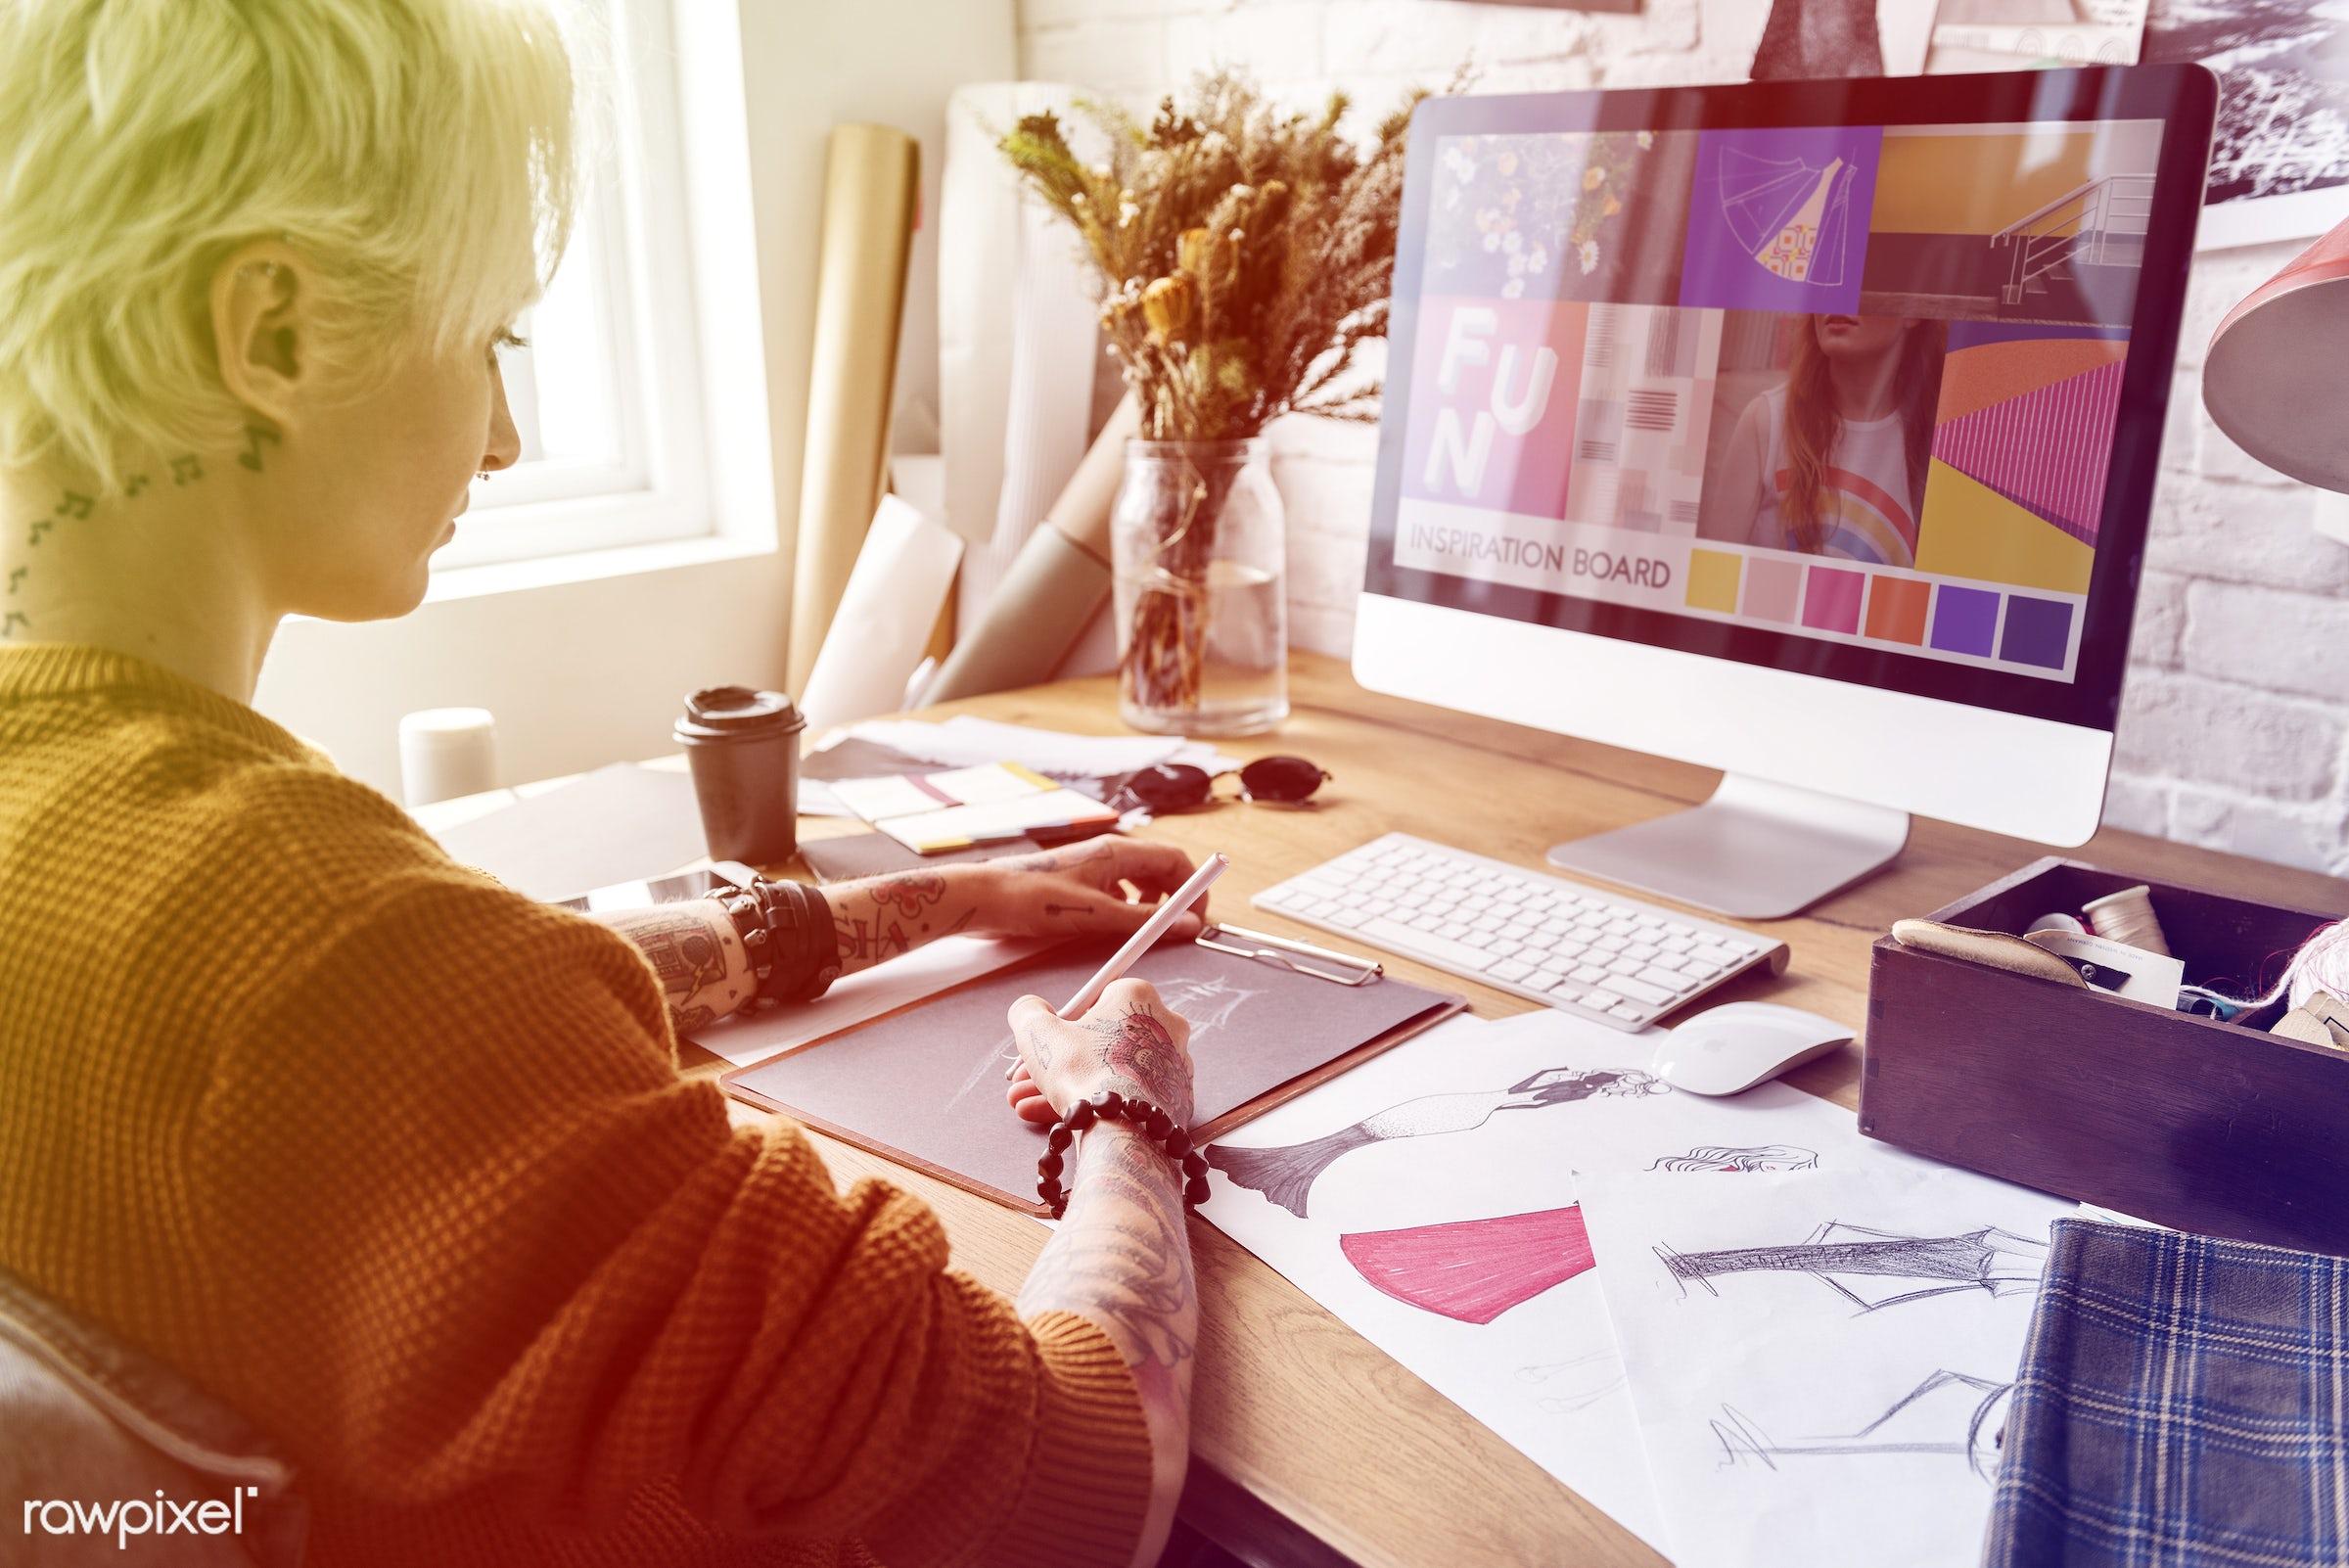 manufacturing, design industry, draw, decor, designers, tattoo, shirt, work, workshop, fashion designing, creative, clothes...